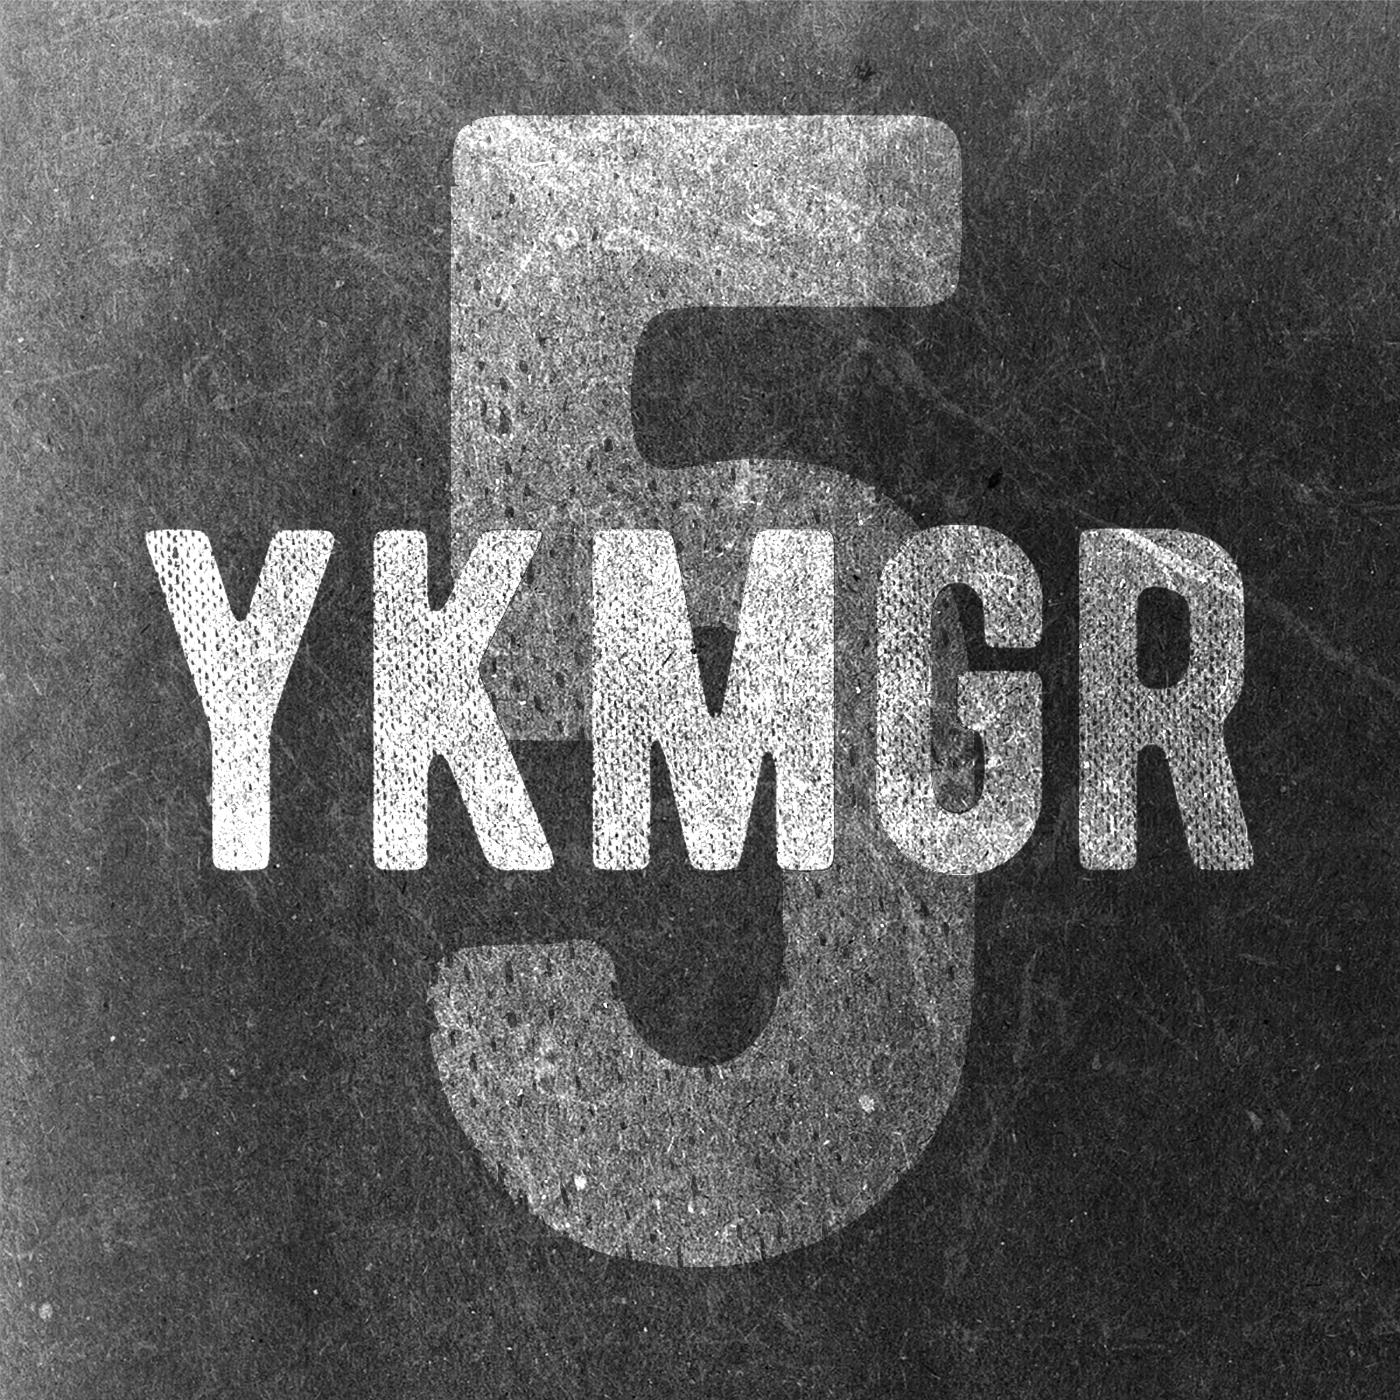 YKMGR 05.png